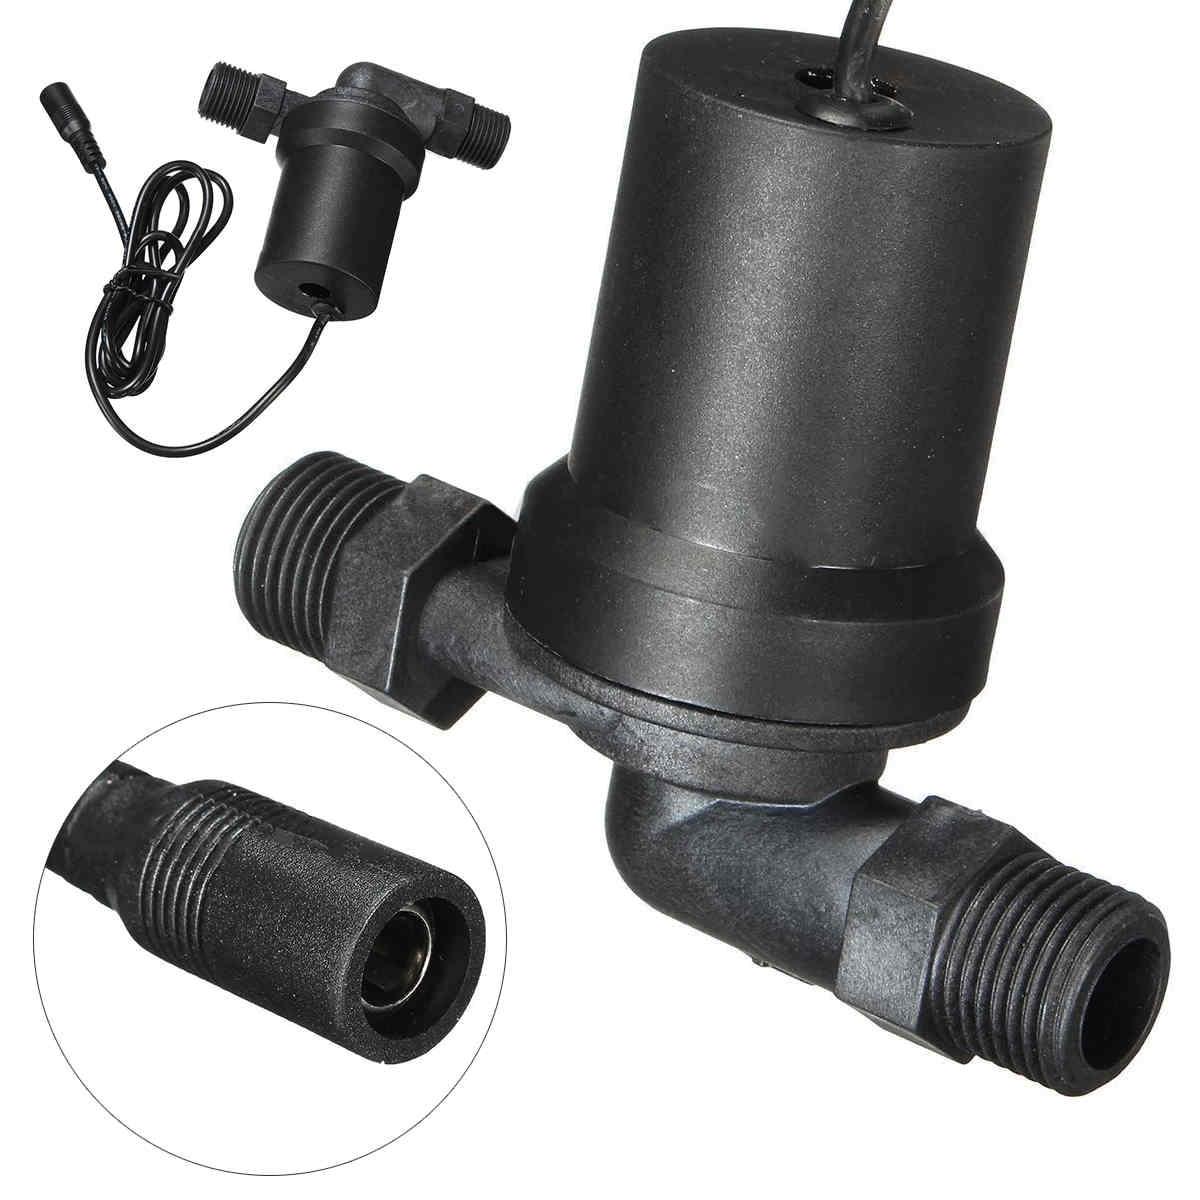 Mayitr Solar Warmwasserzirkulationspumpe Brushless Motor 1/2 zoll Gewinde 650L/H Brushless Wasserpumpe 12 V DC Neue